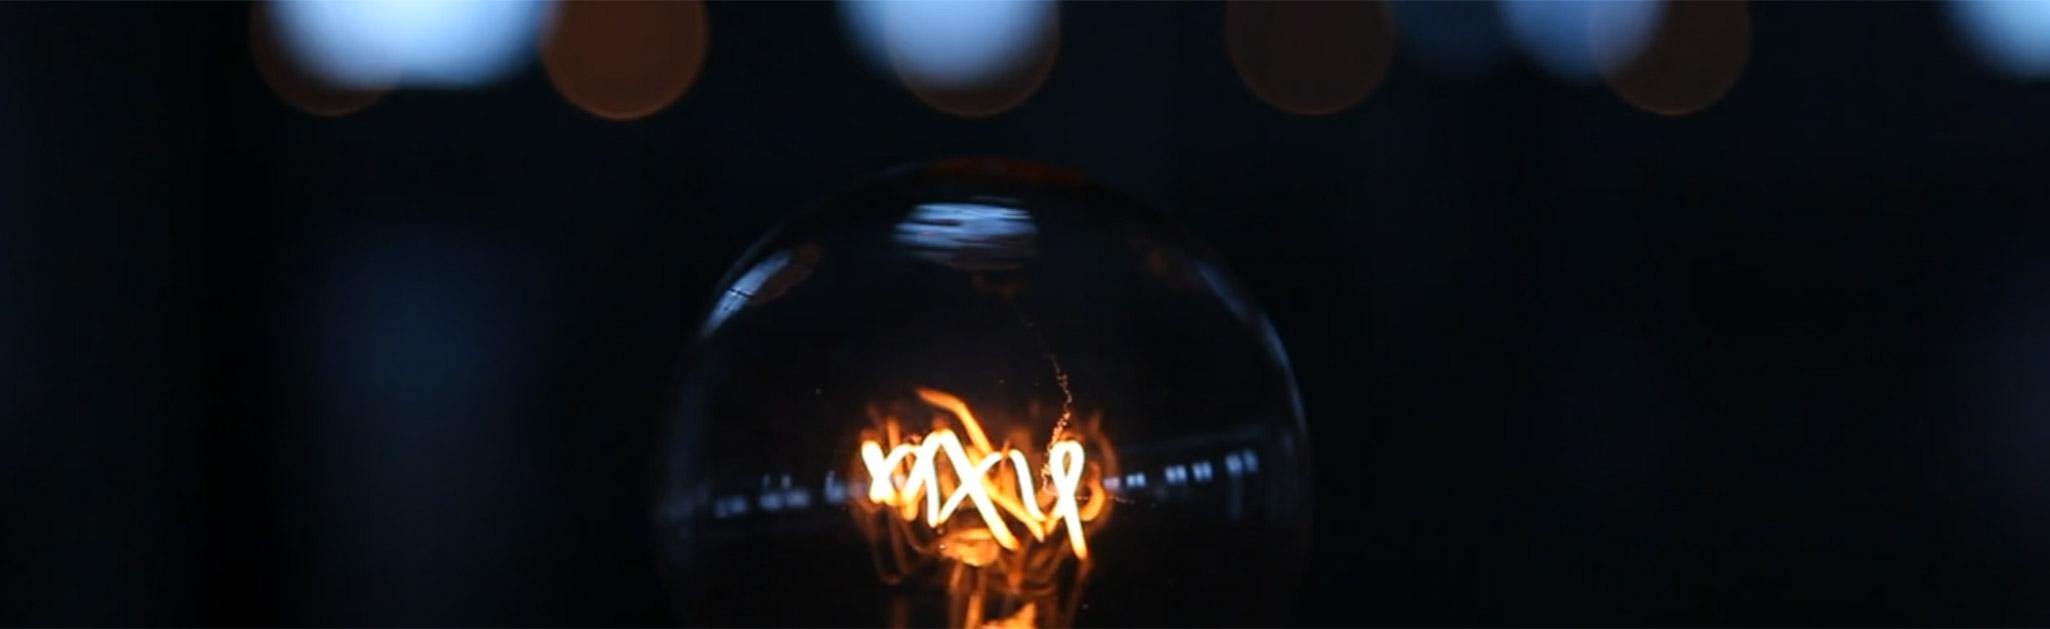 Diamo nuova luce alle idee